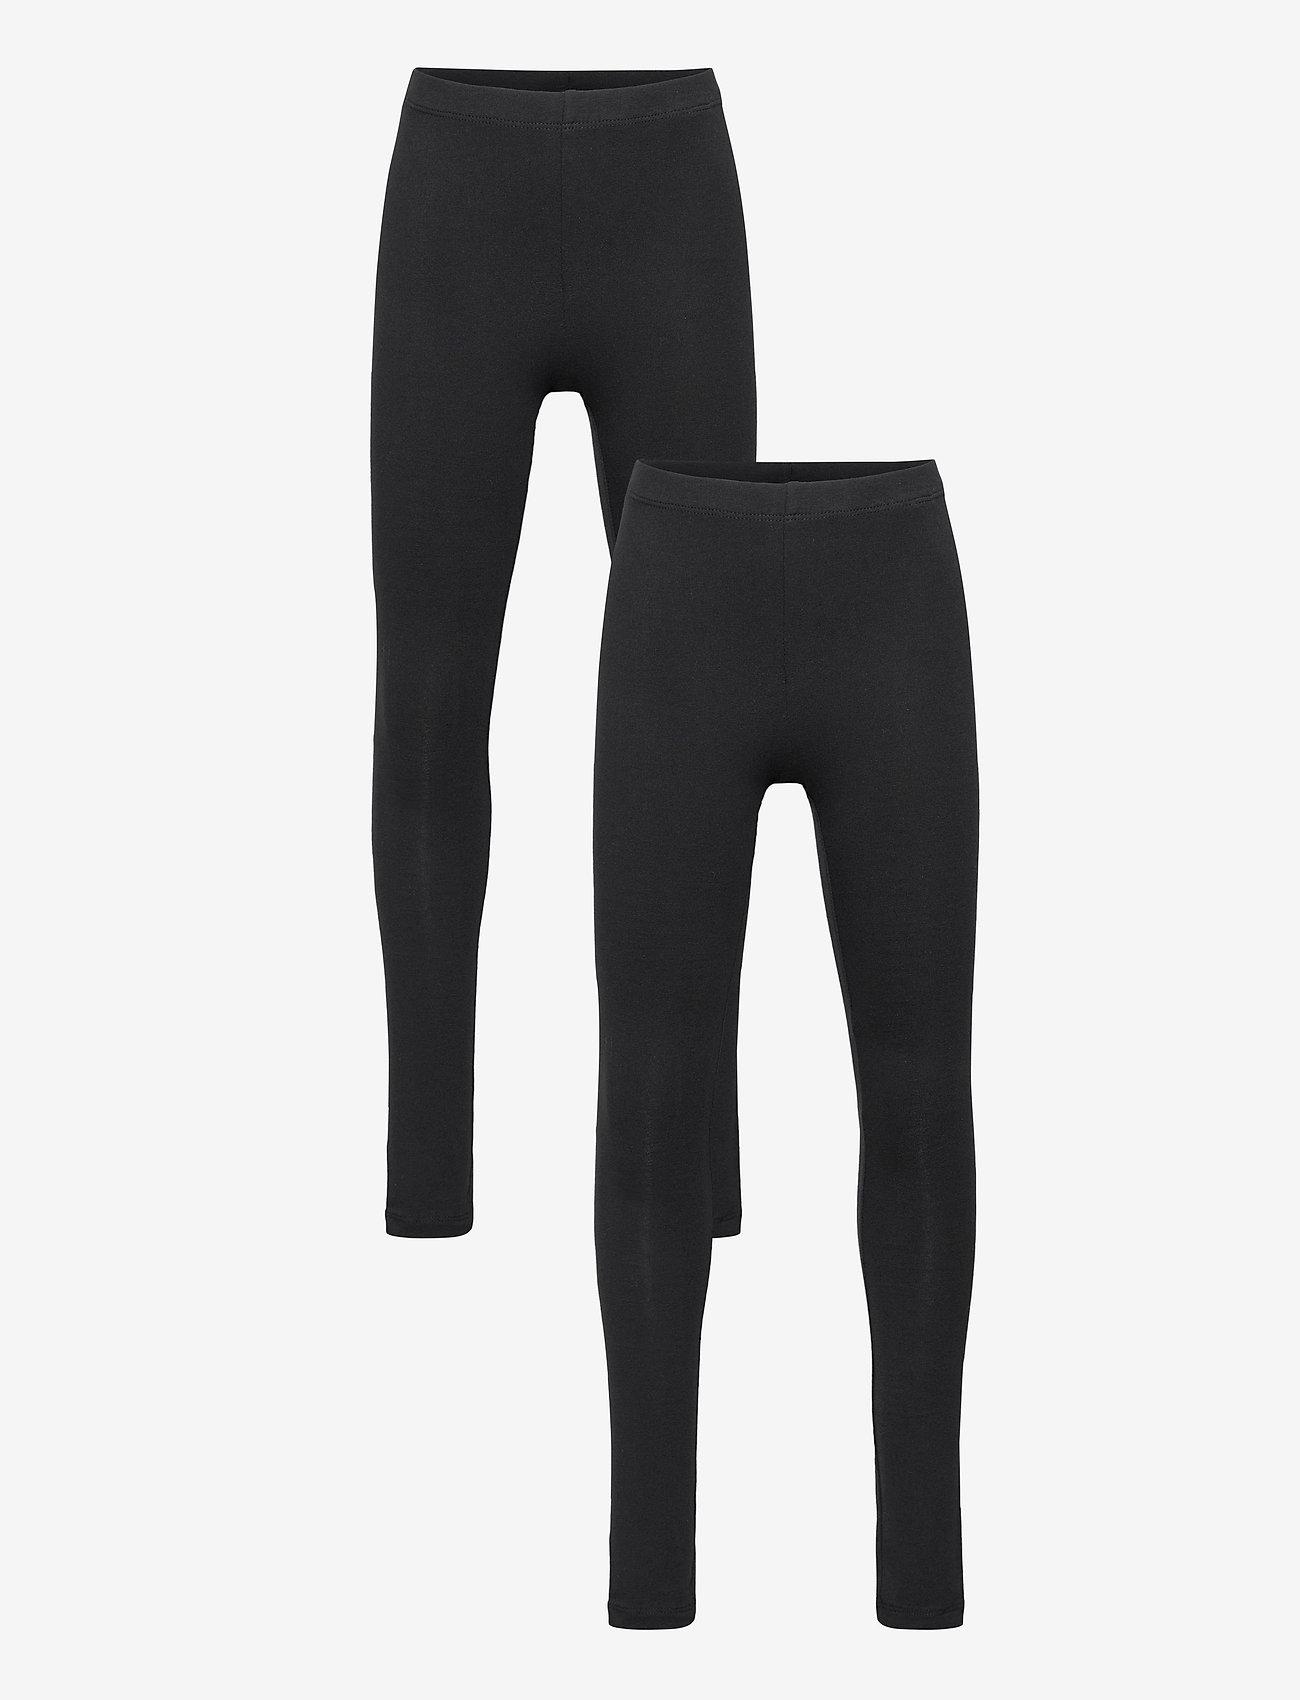 name it - NKFVIVIAN 2P LEGGING NOOS - leggings - black - 0